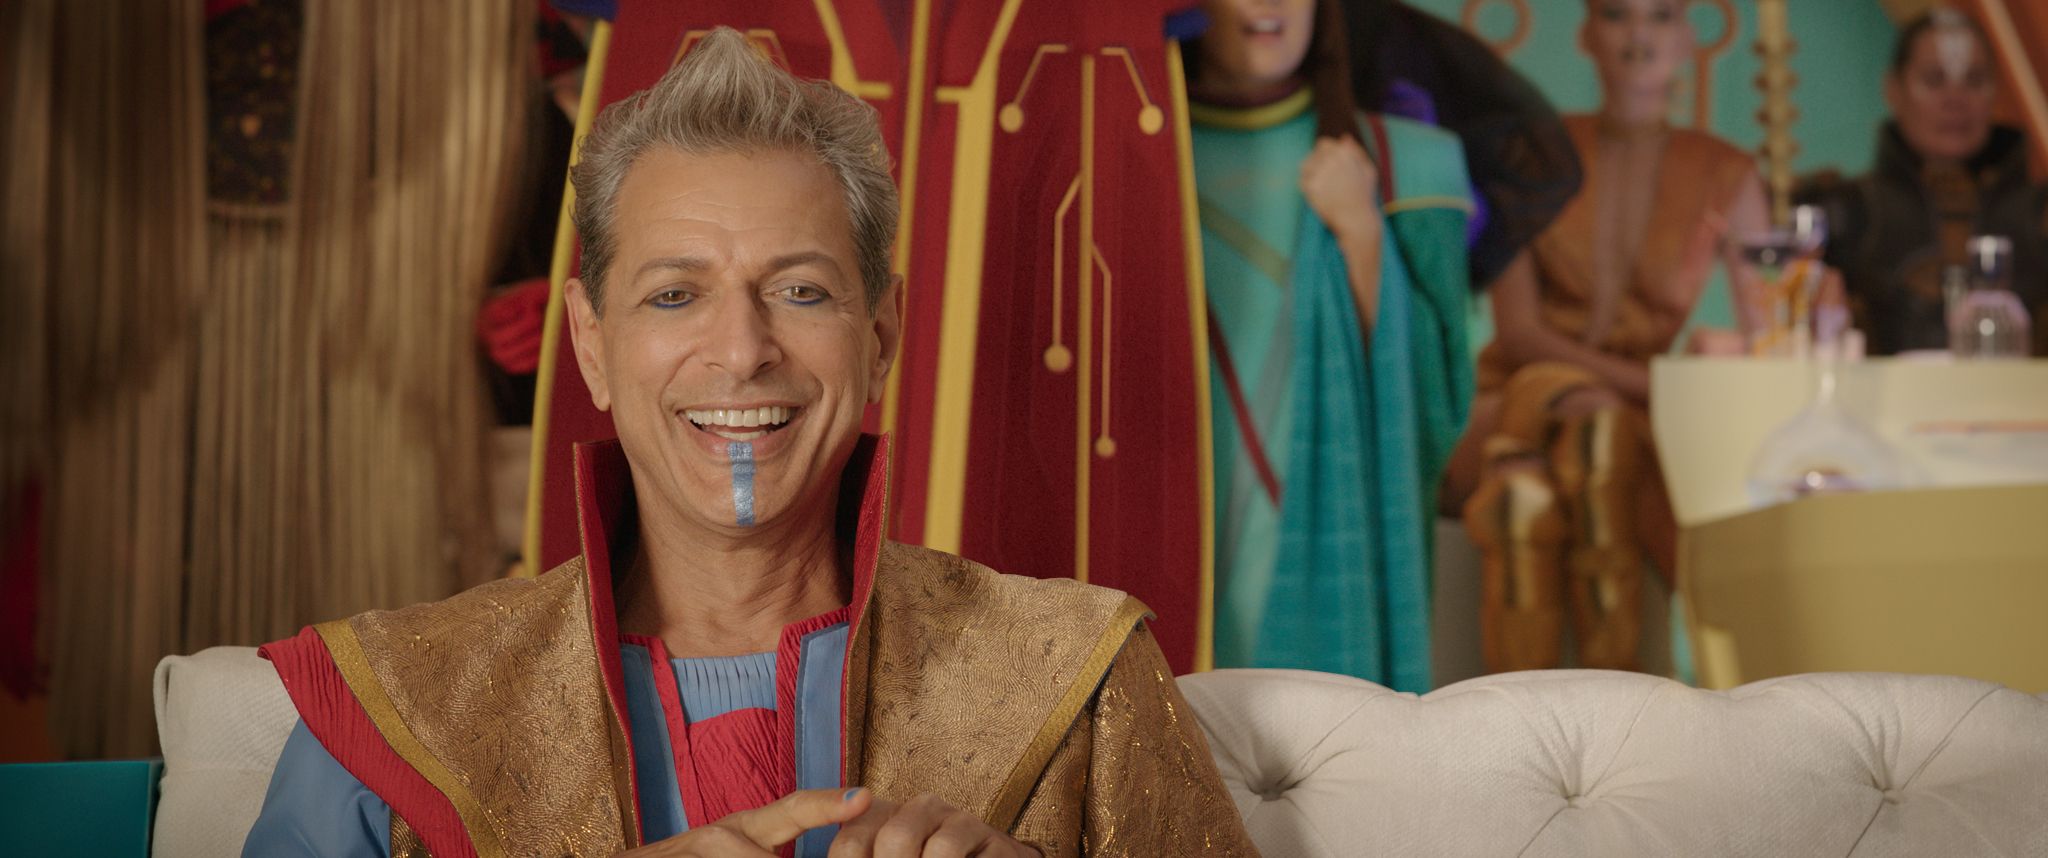 What's so funny? Jeff Goldblum in Thor: Ragnarok (Marvel Studios, JG)